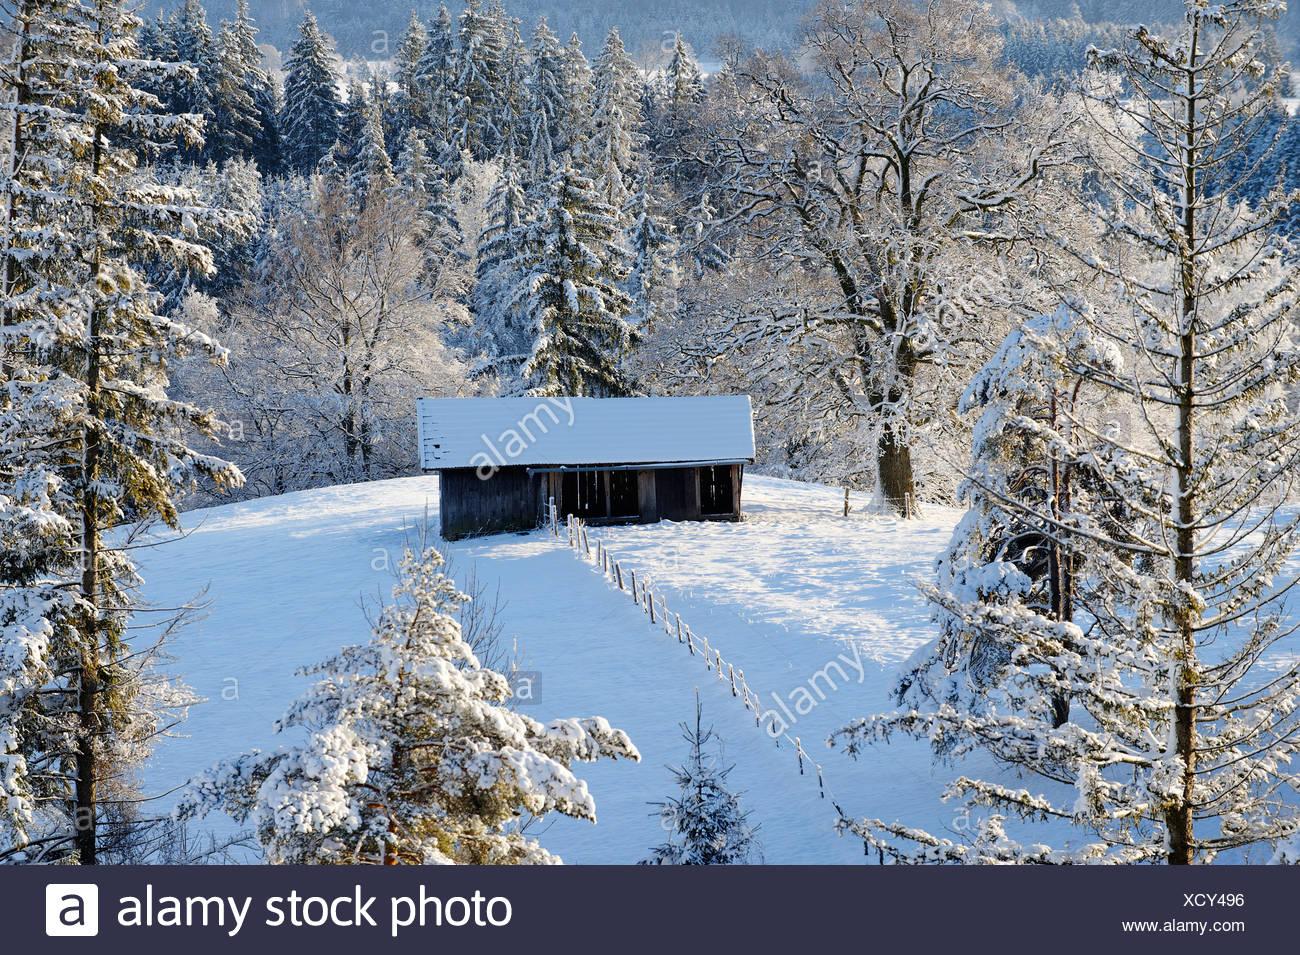 Wintery snow-covered barn at the Aidlinger Hoehe, Murnau, Pfaffenwinkel region, Upper Bavaria, Bavaria - Stock Image